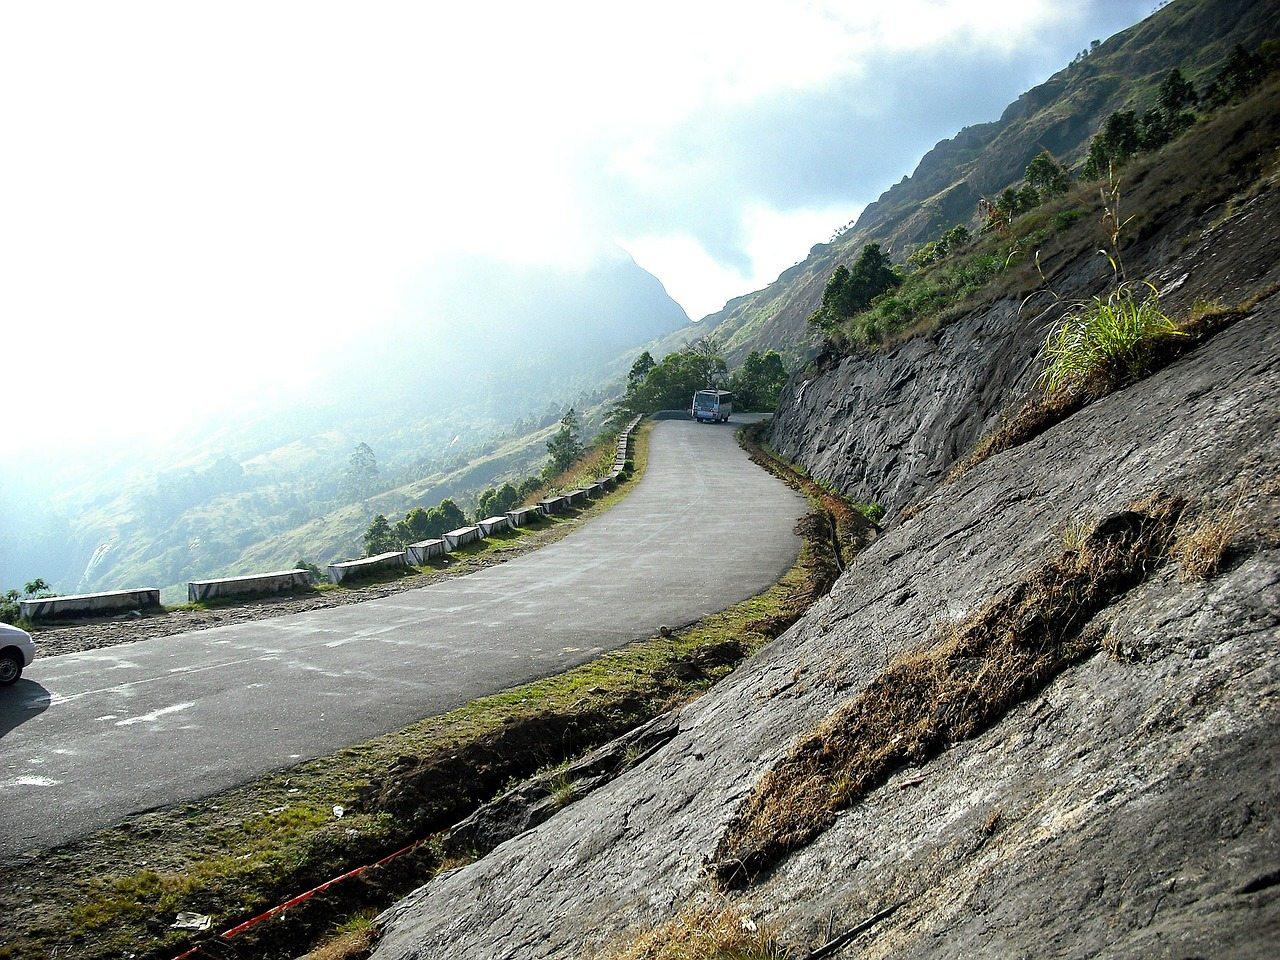 Lakkidi Wayanad Valley Road